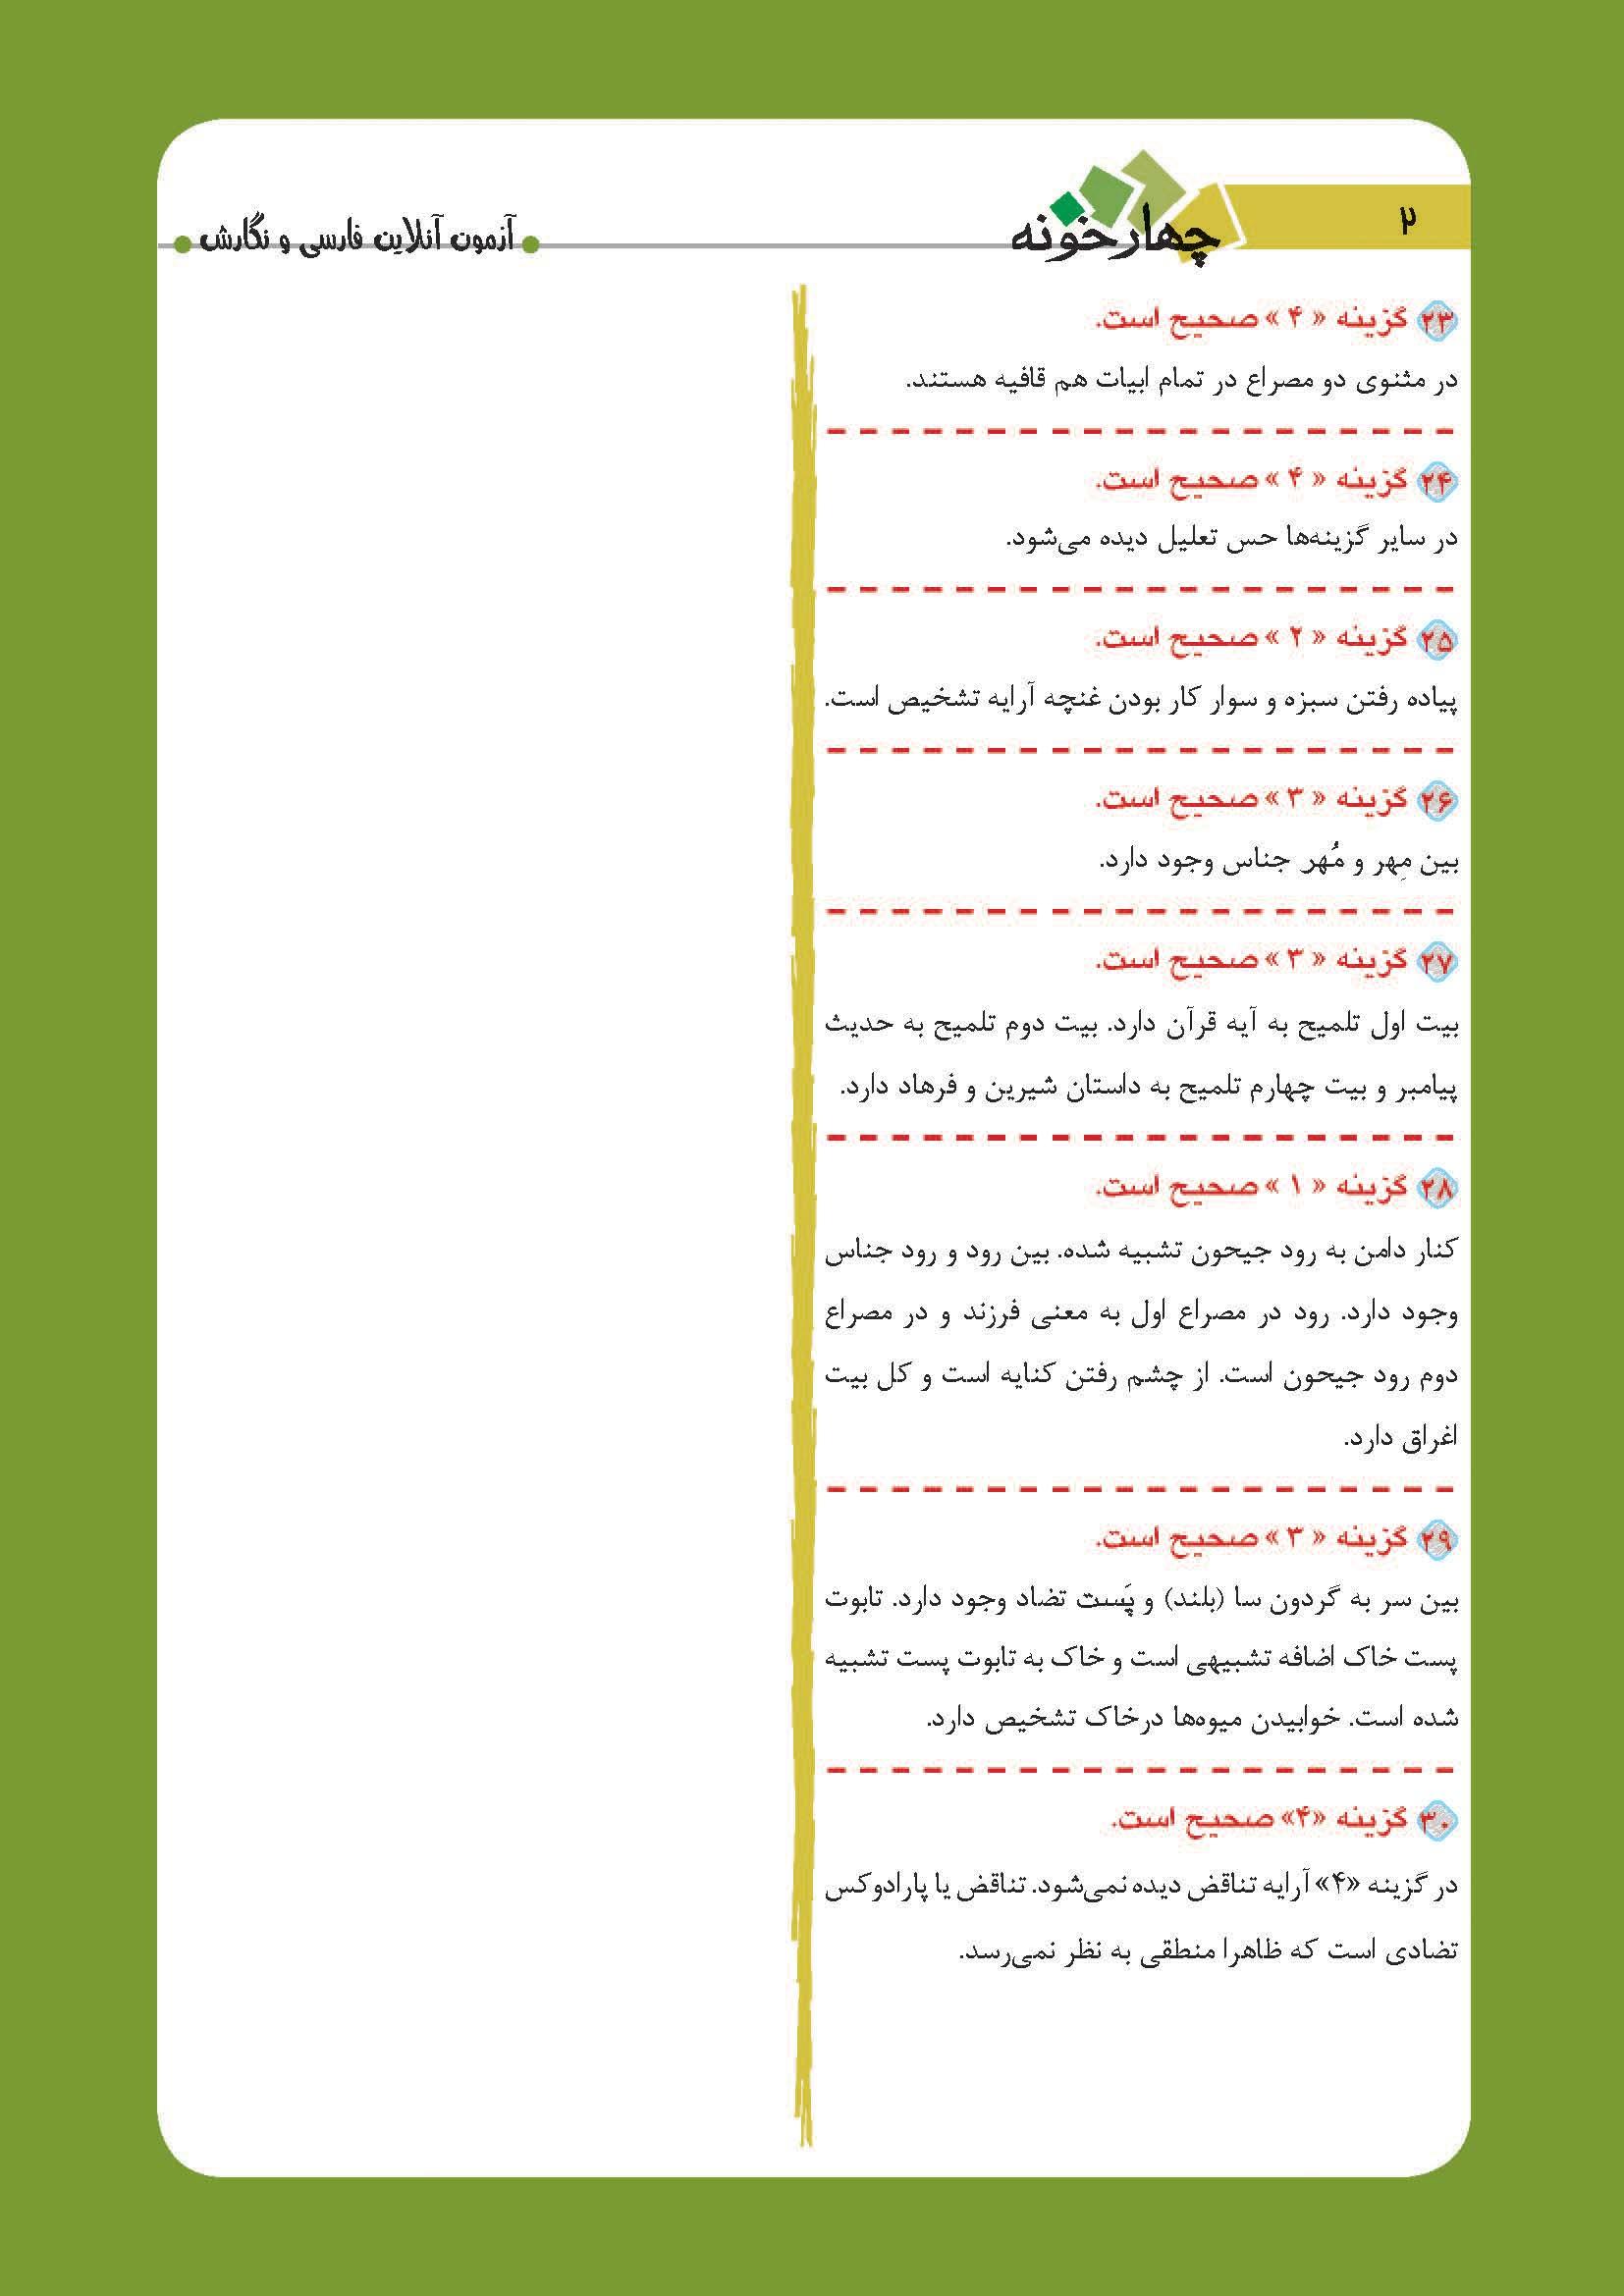 آزمون آنلاین فارسی و نگارش